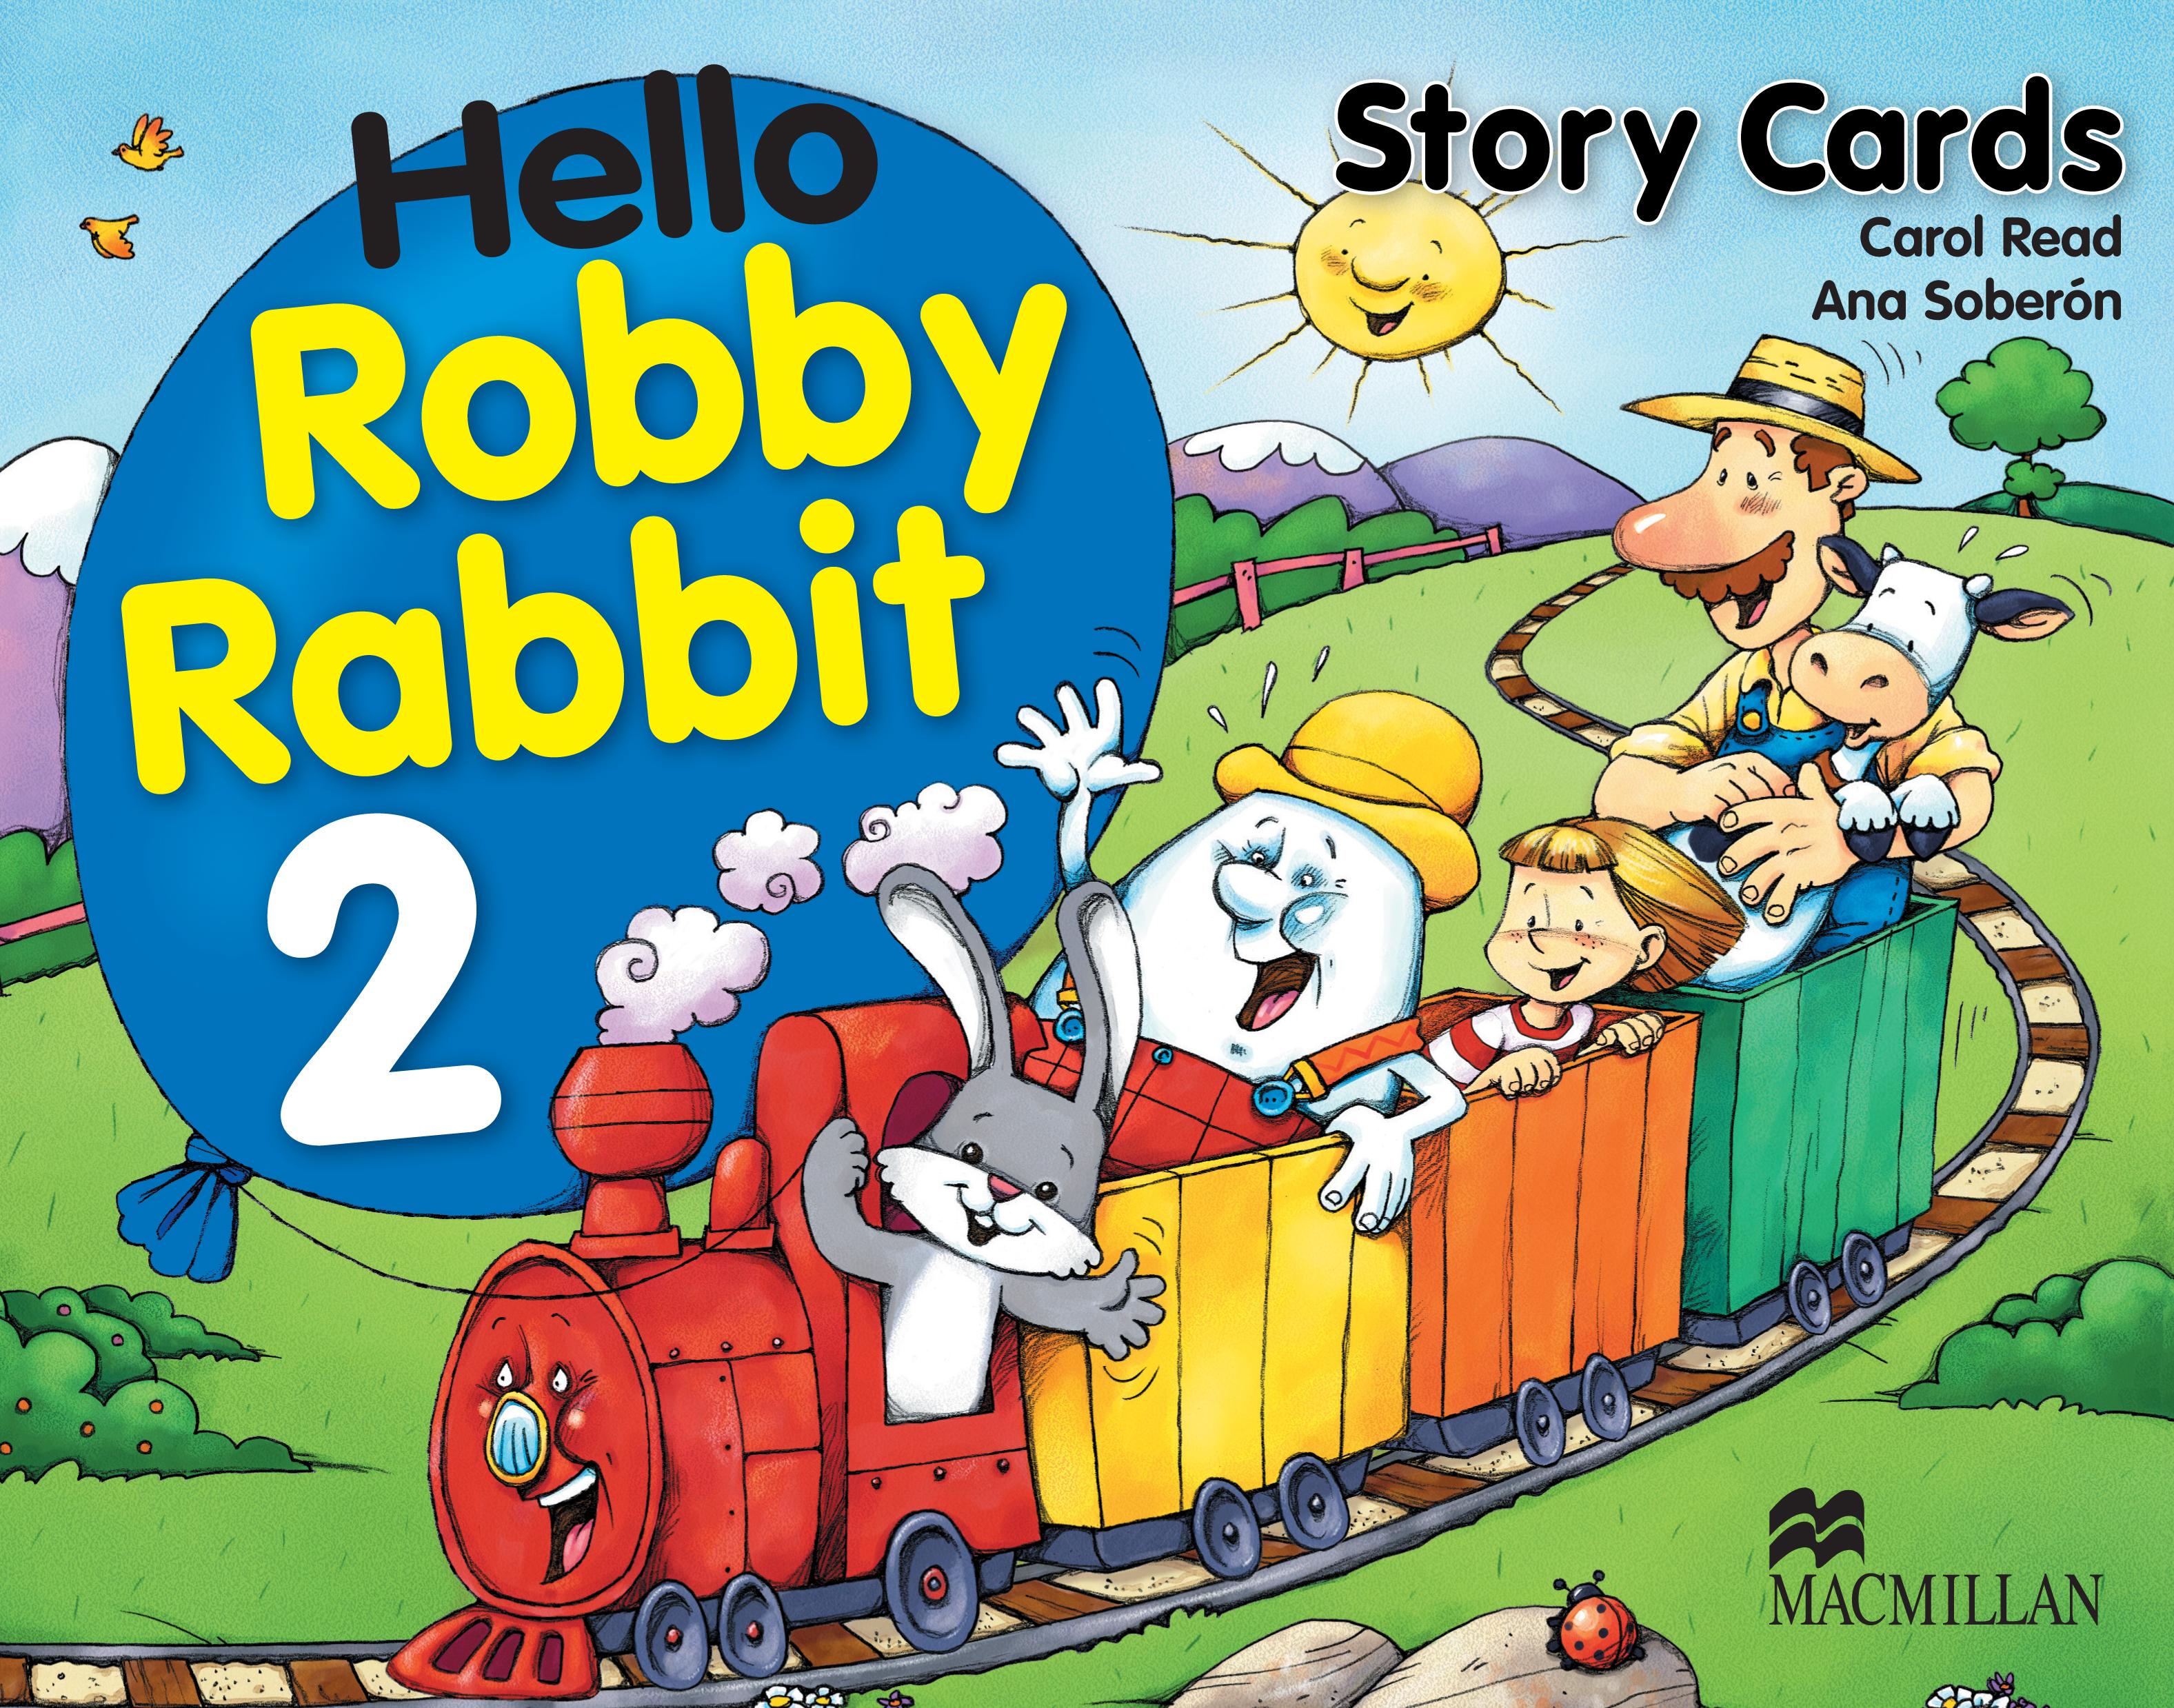 Hello Robby Rabbit 2 Story Cards